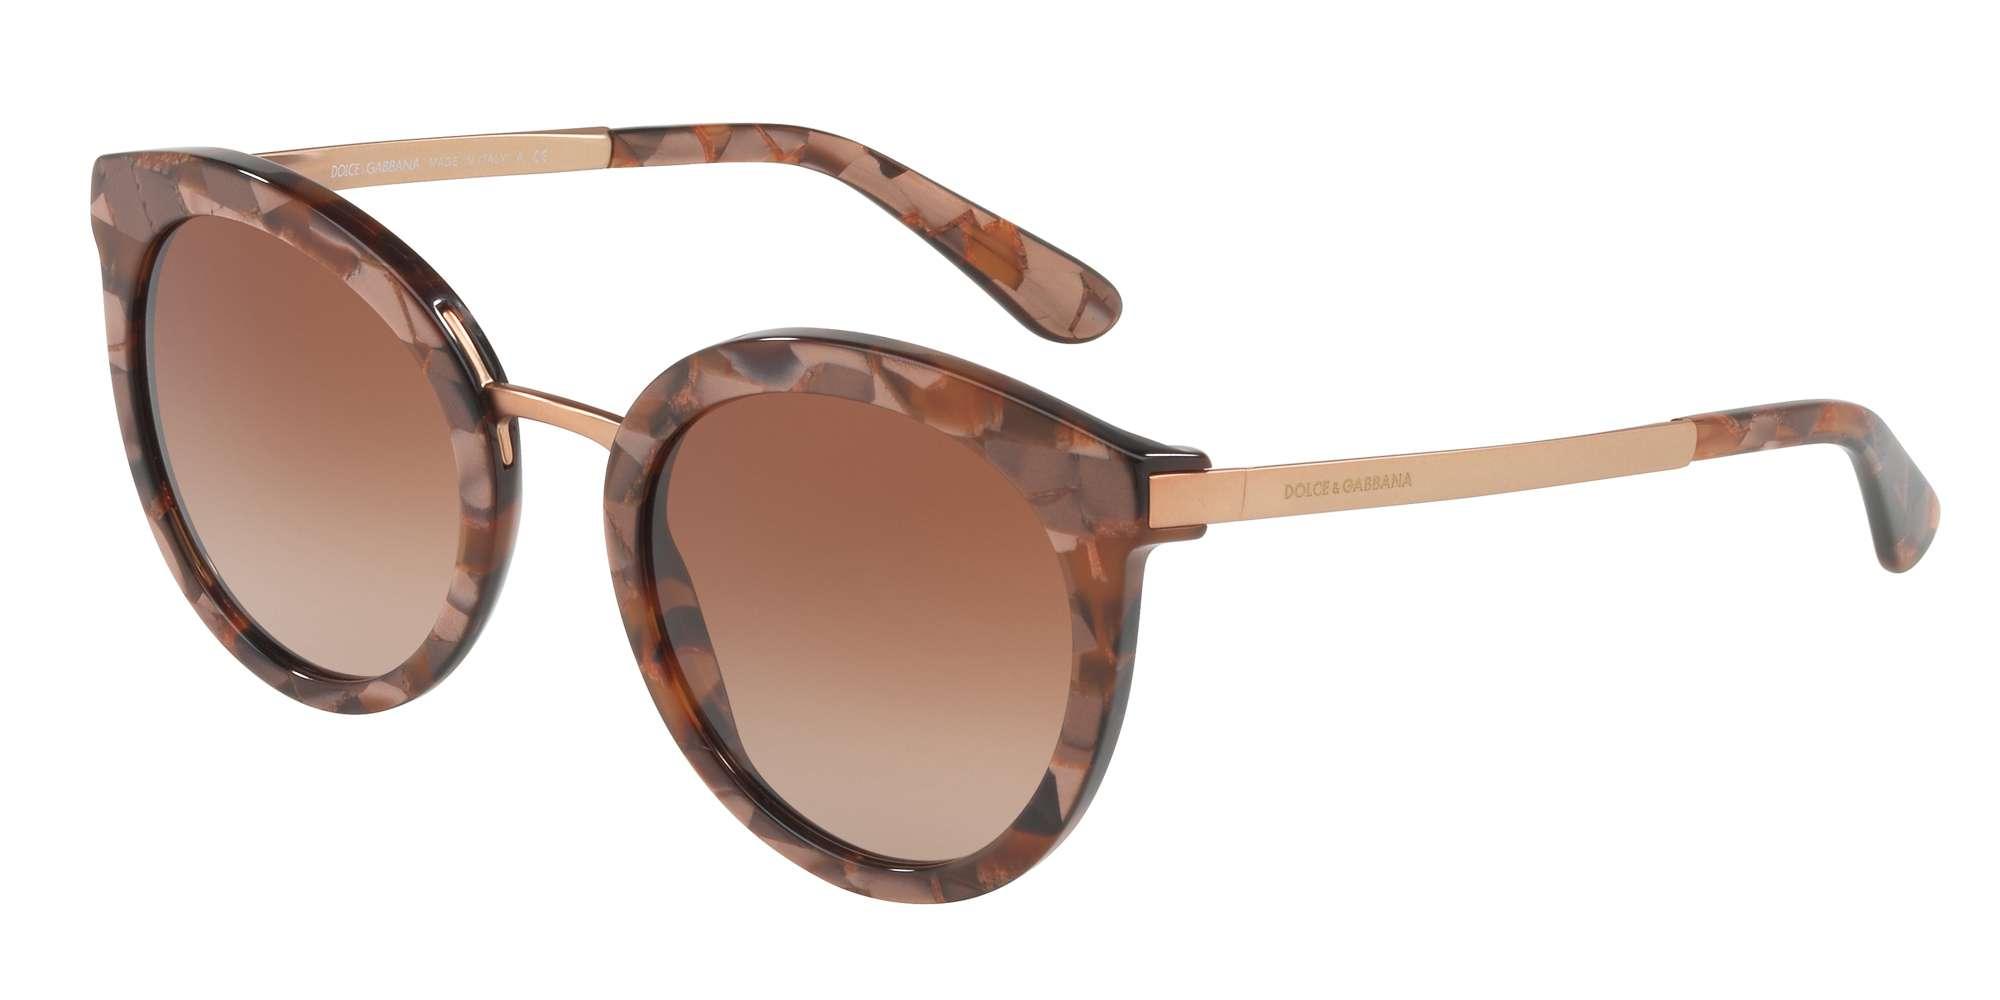 CUBE BRONZE / BROWN GRADIENT lenses